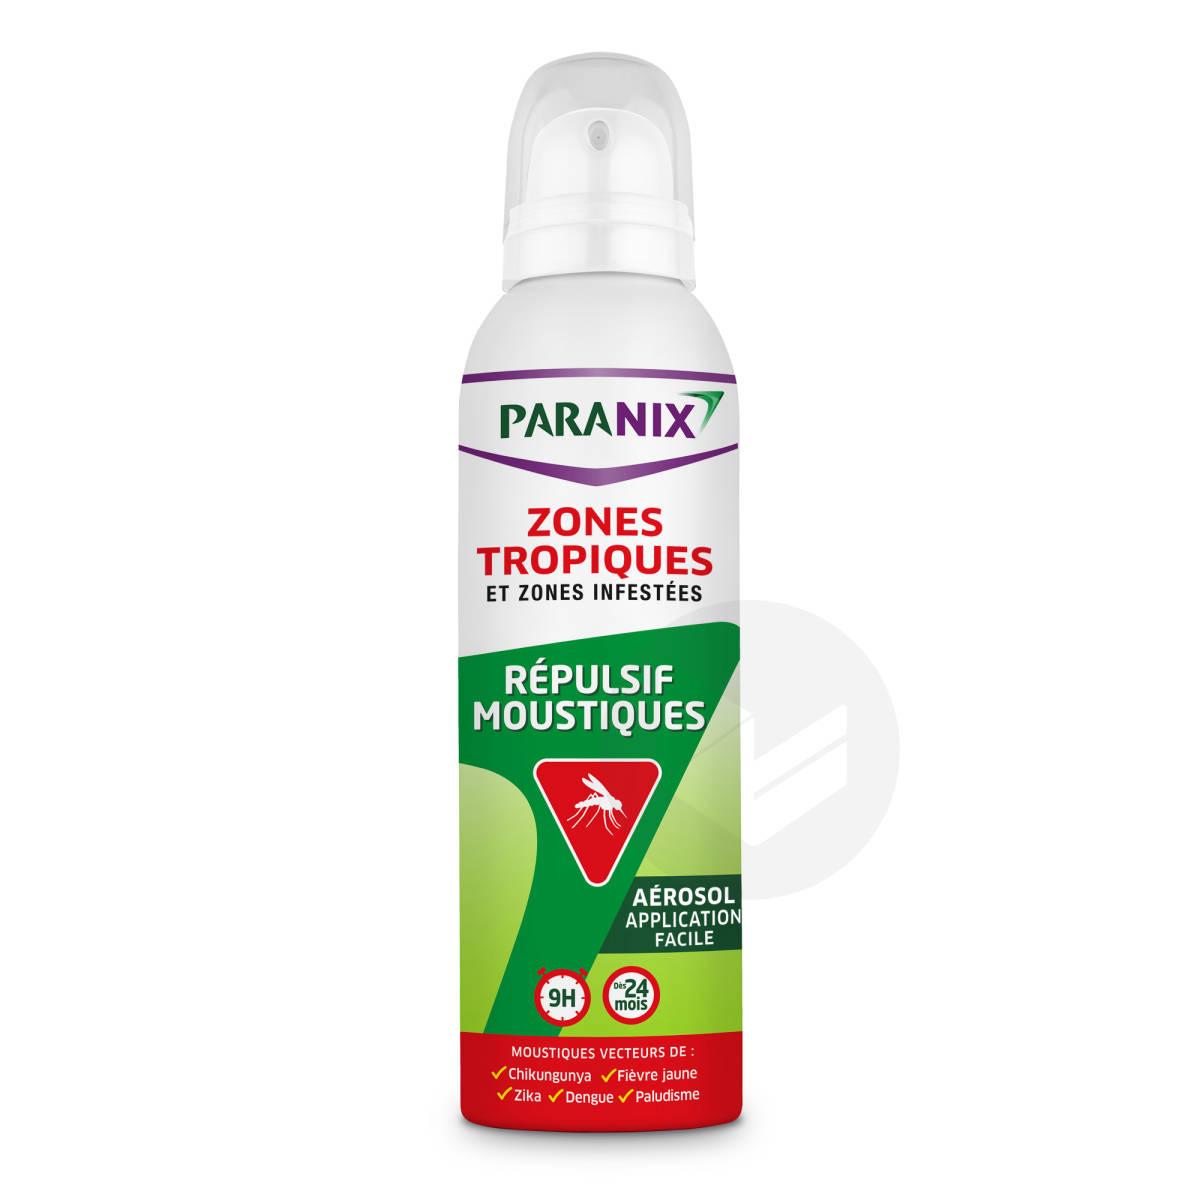 Repulsif Moustiques Zones Tropiques Et Zones Infestees 125 Ml